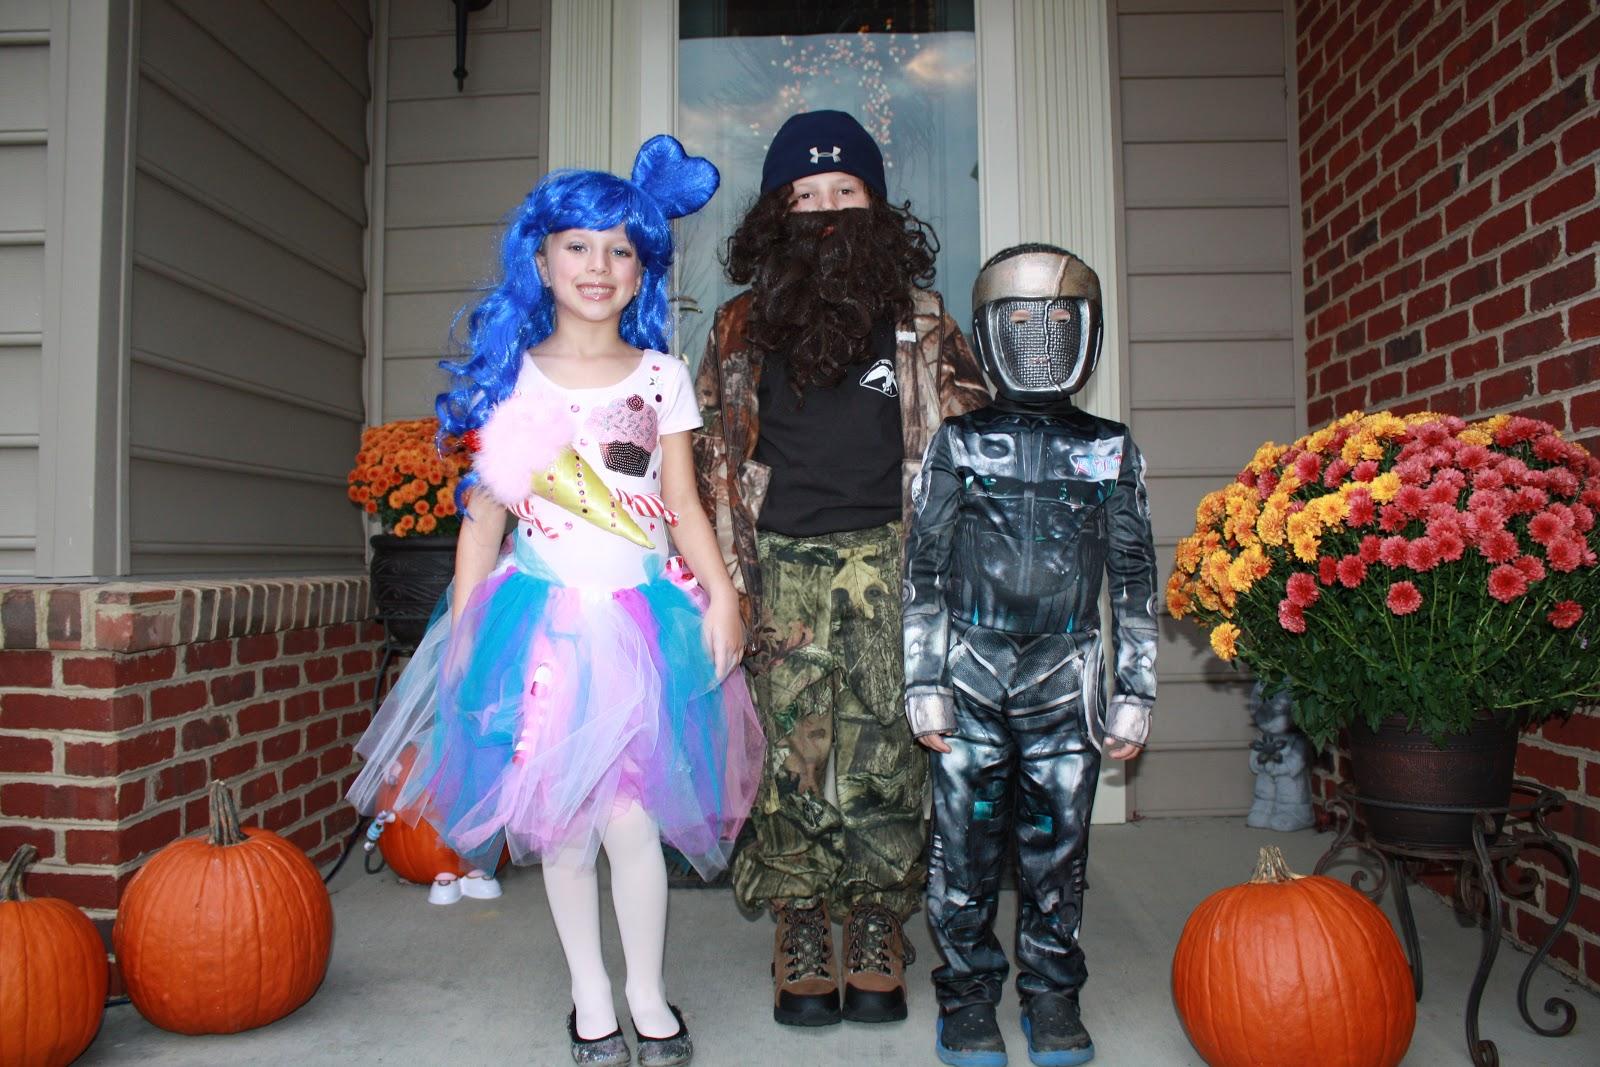 halloween 2012 - Jase Robertson Halloween Costume